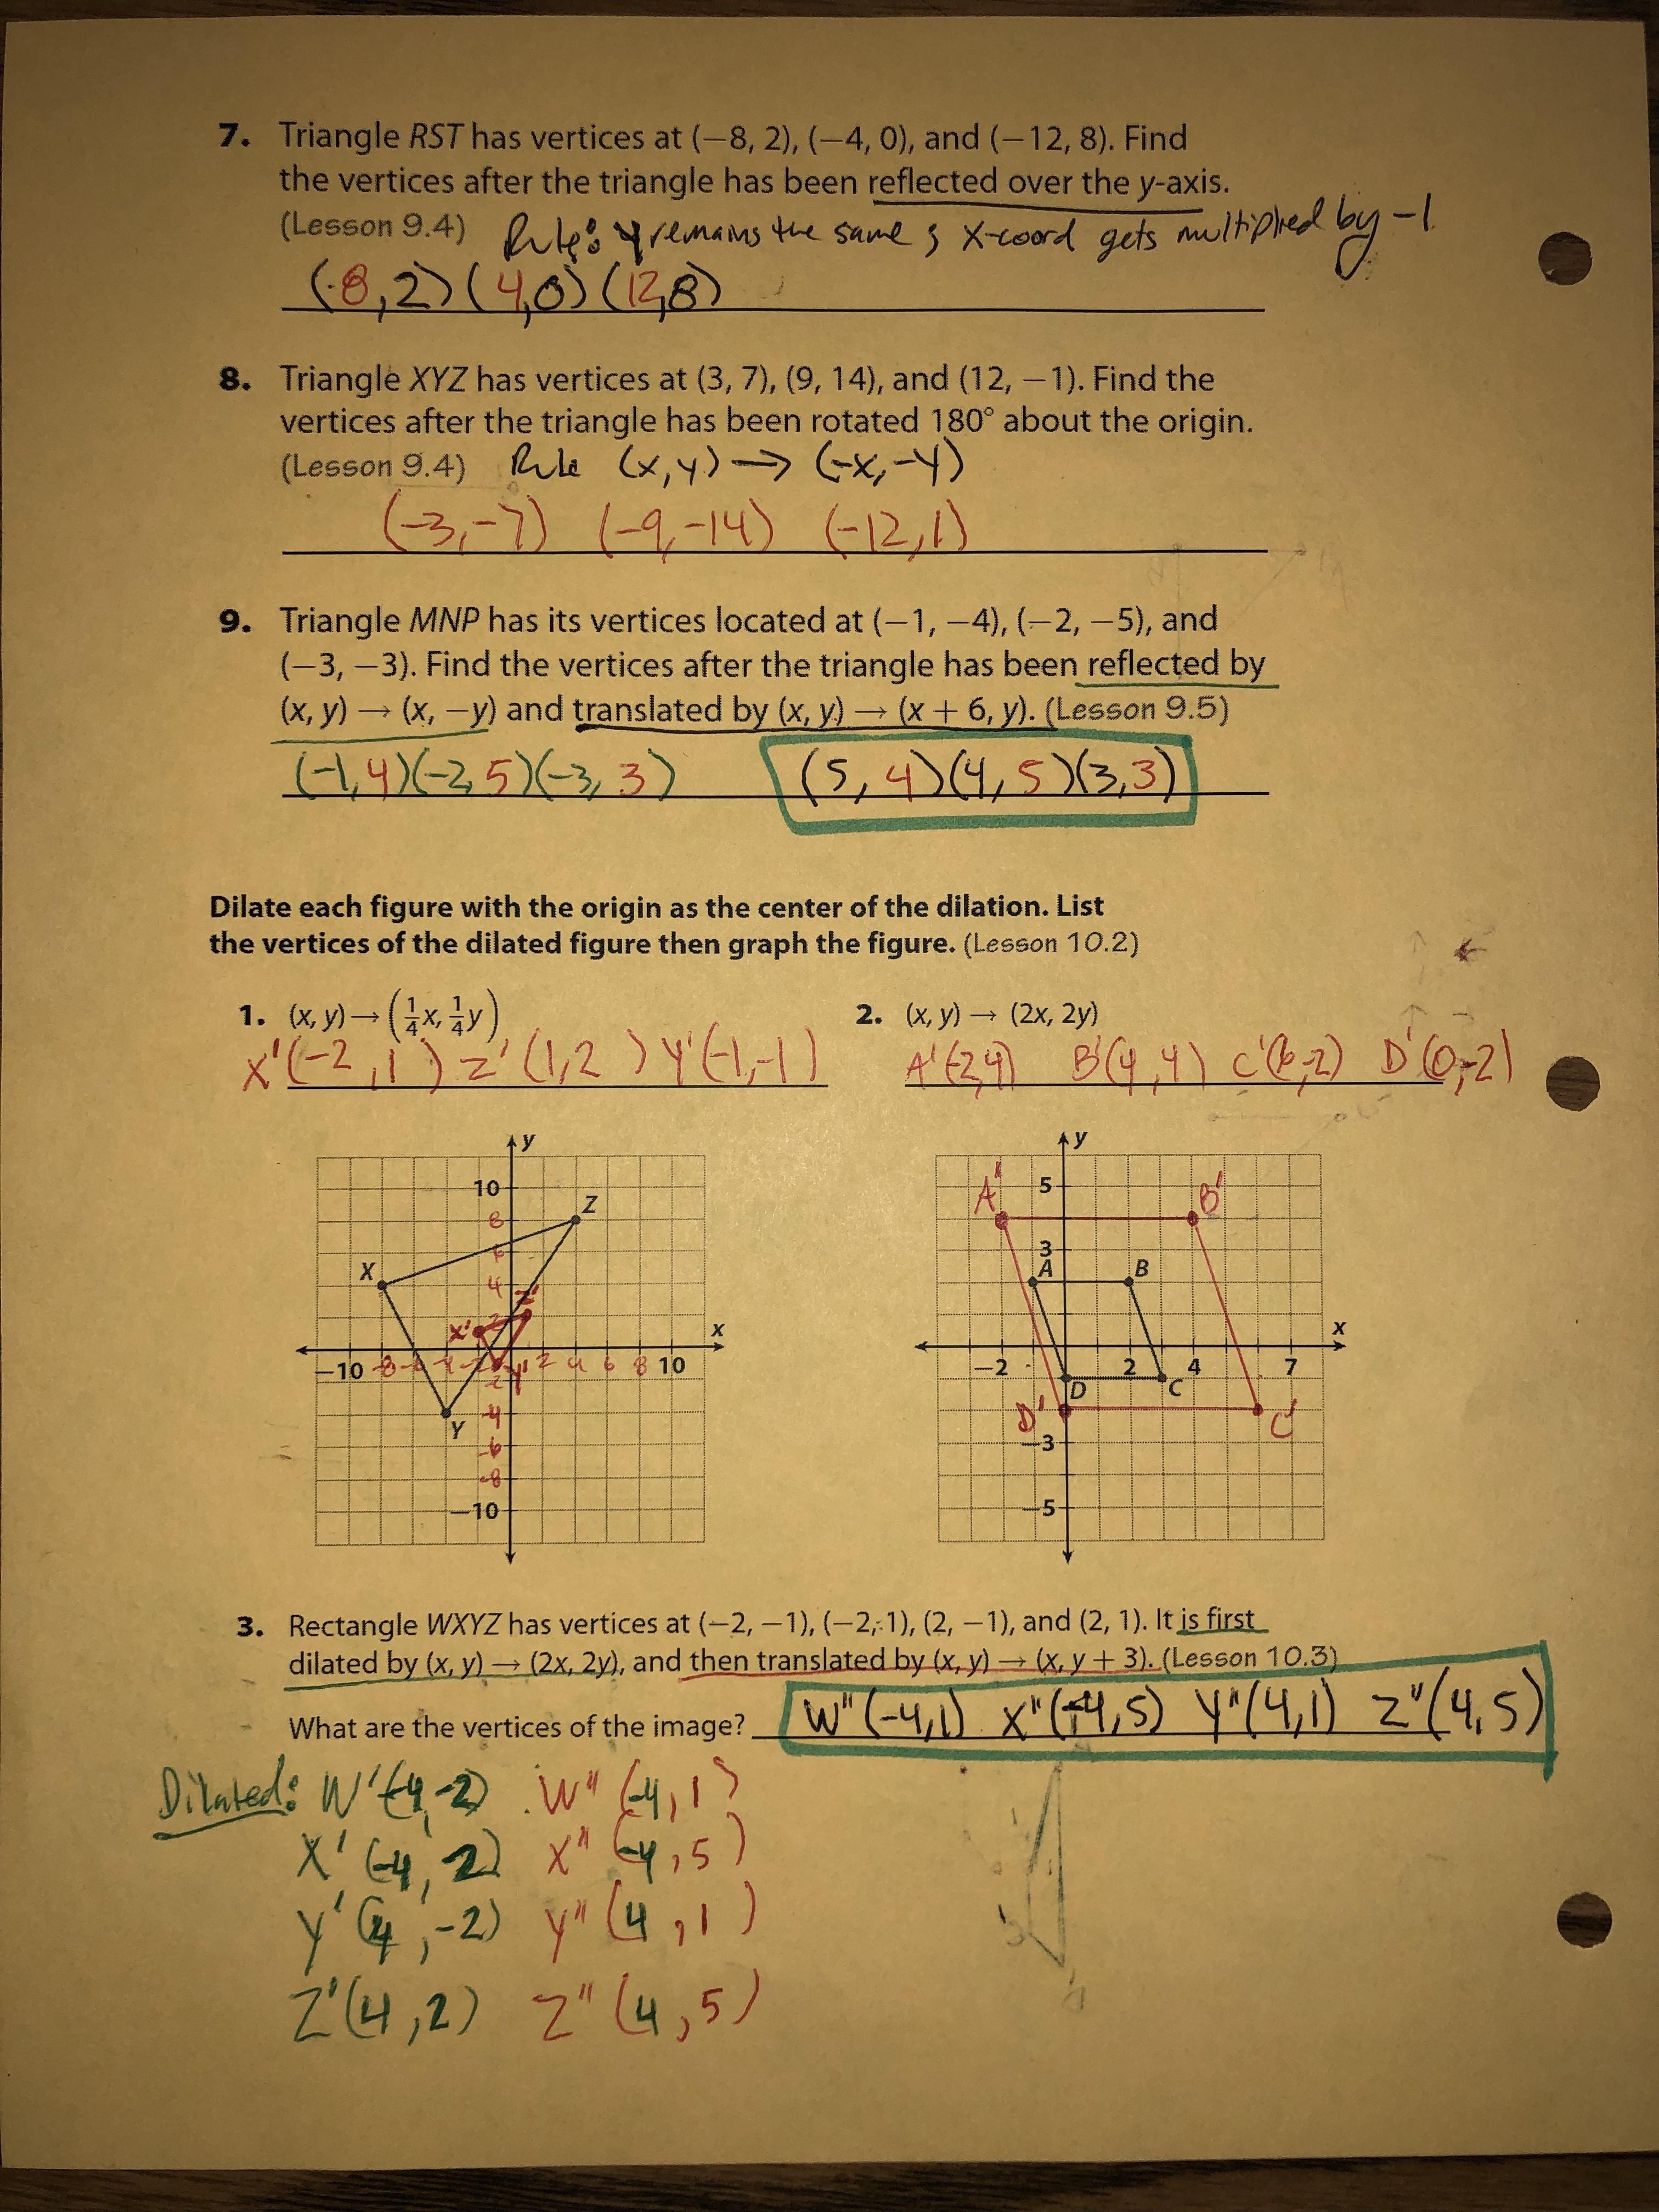 Adams middle school unit 5 study guide keybackg fandeluxe Choice Image